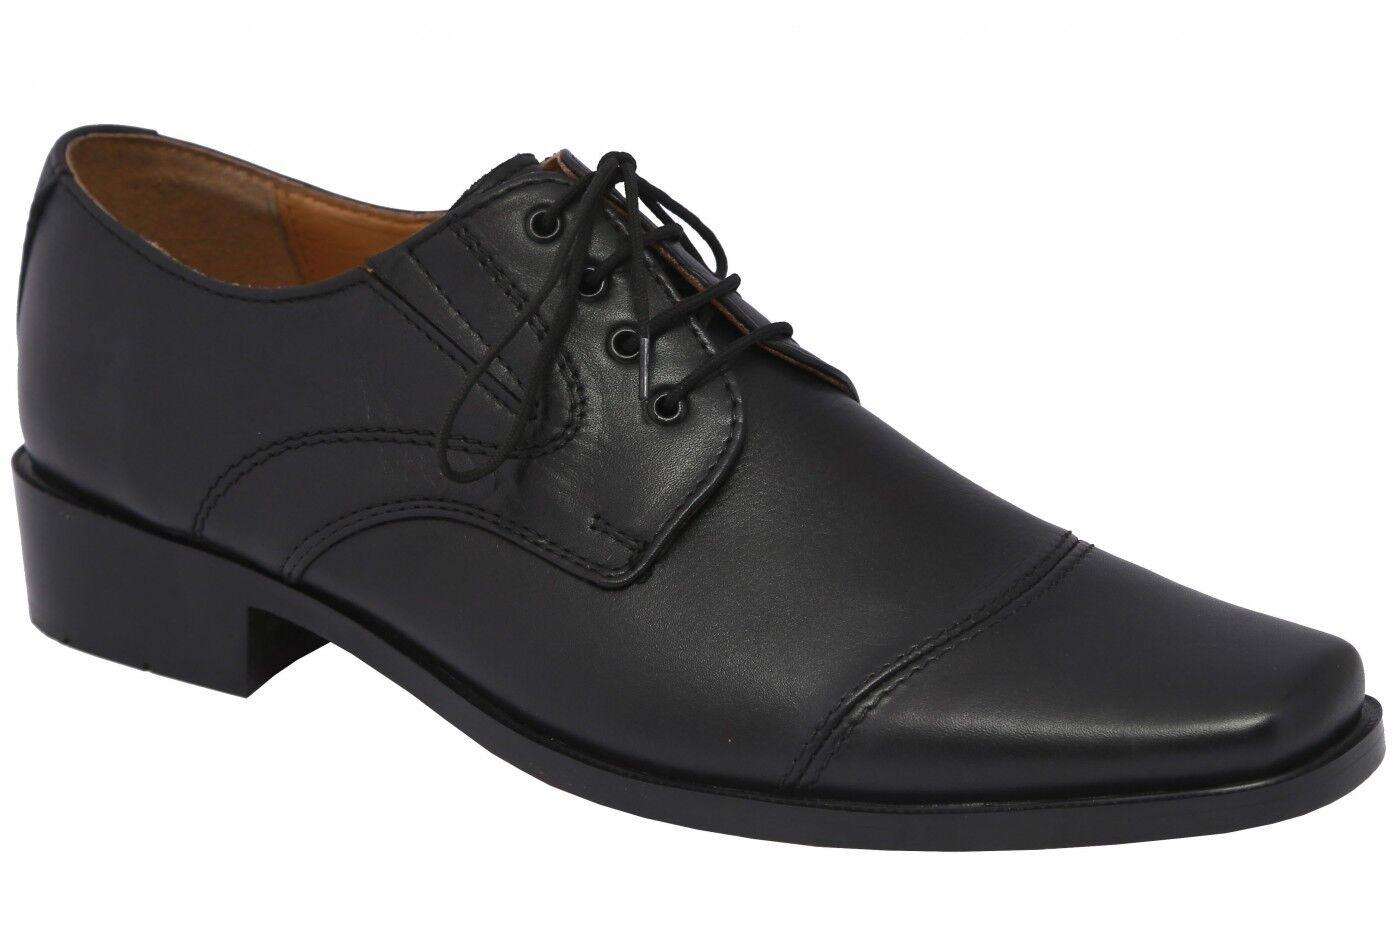 German Wear,Business-schuhe Halbschuhe Lederschuhe mit Ledersohle Schuhe schwarz